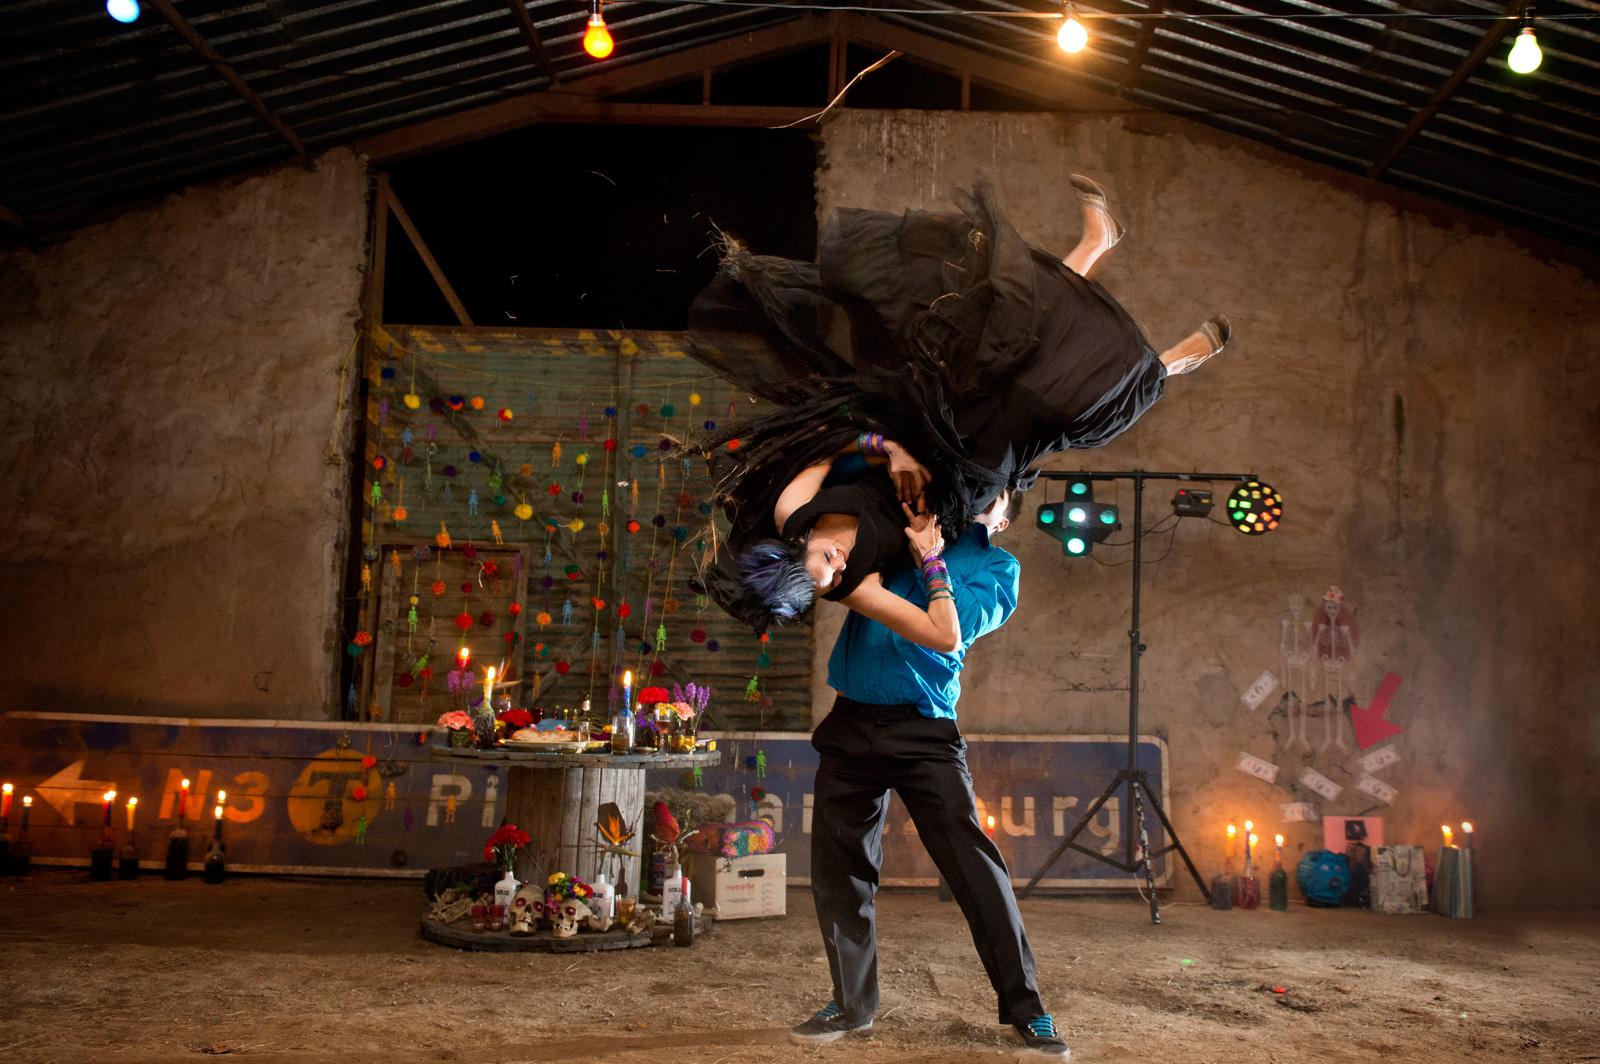 Dancing-Jacki-Bruniquel-Hoorah001